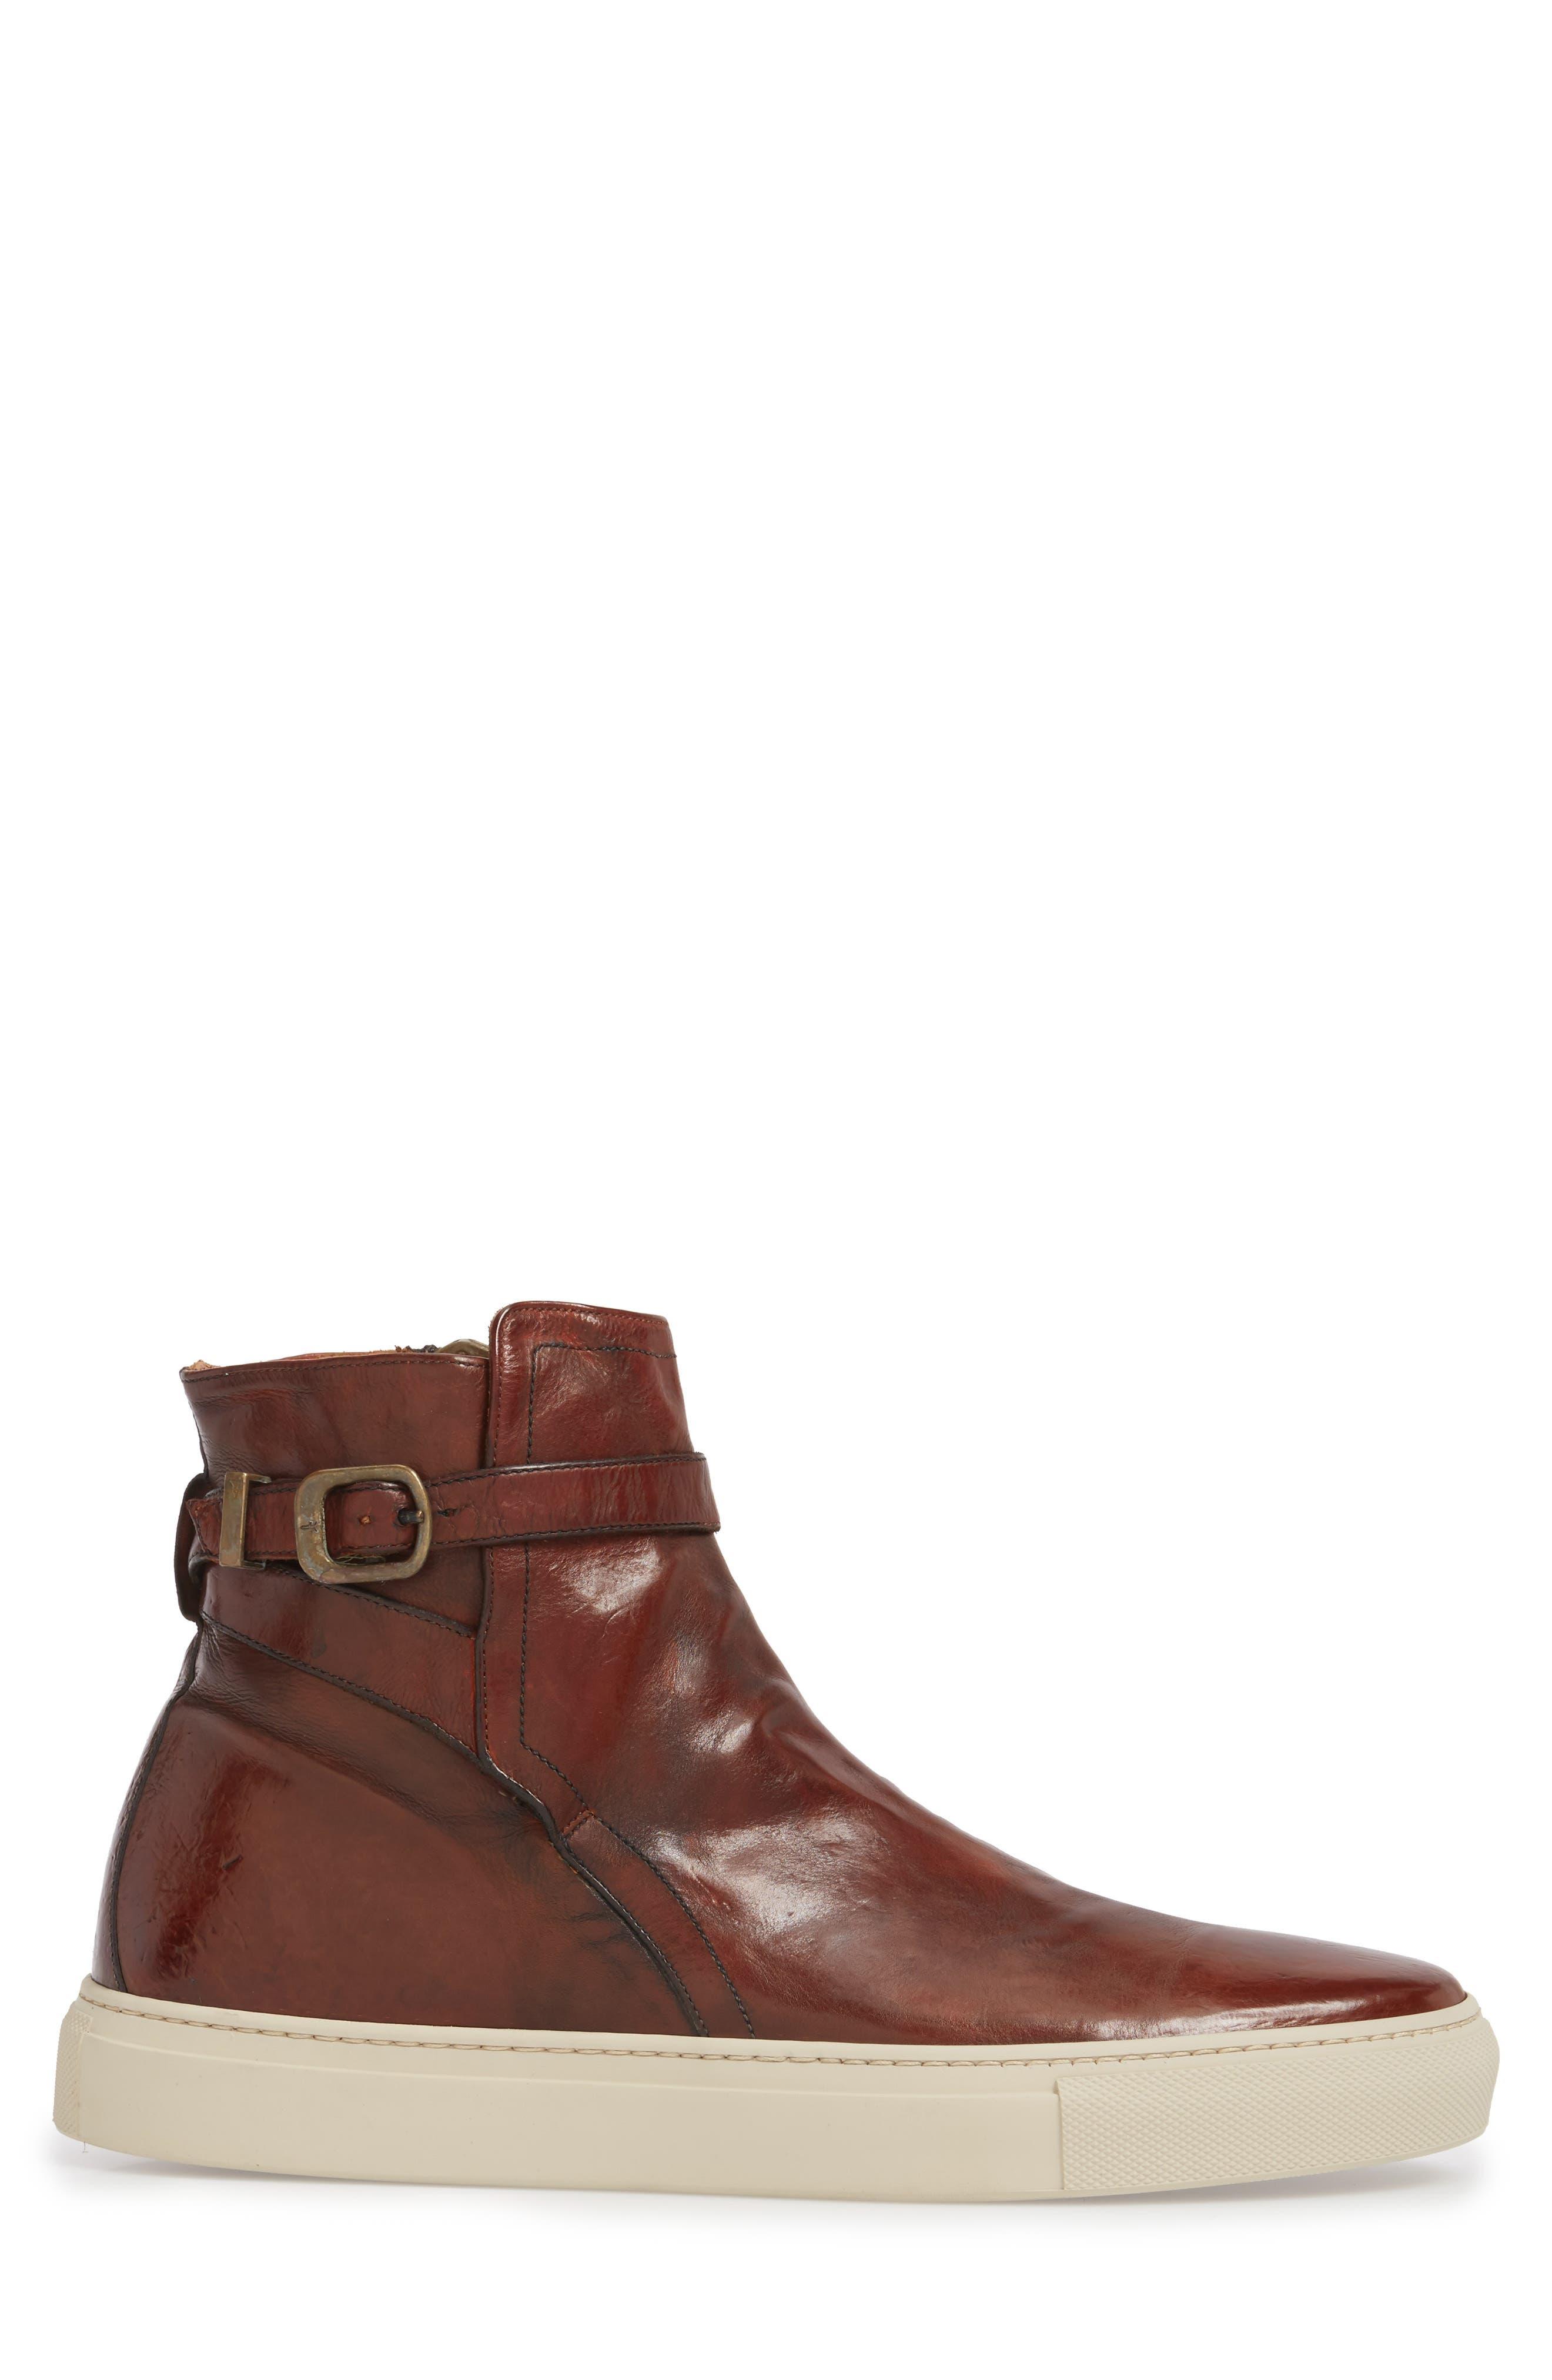 Owen Jodhpur High Top Sneaker,                             Alternate thumbnail 6, color,